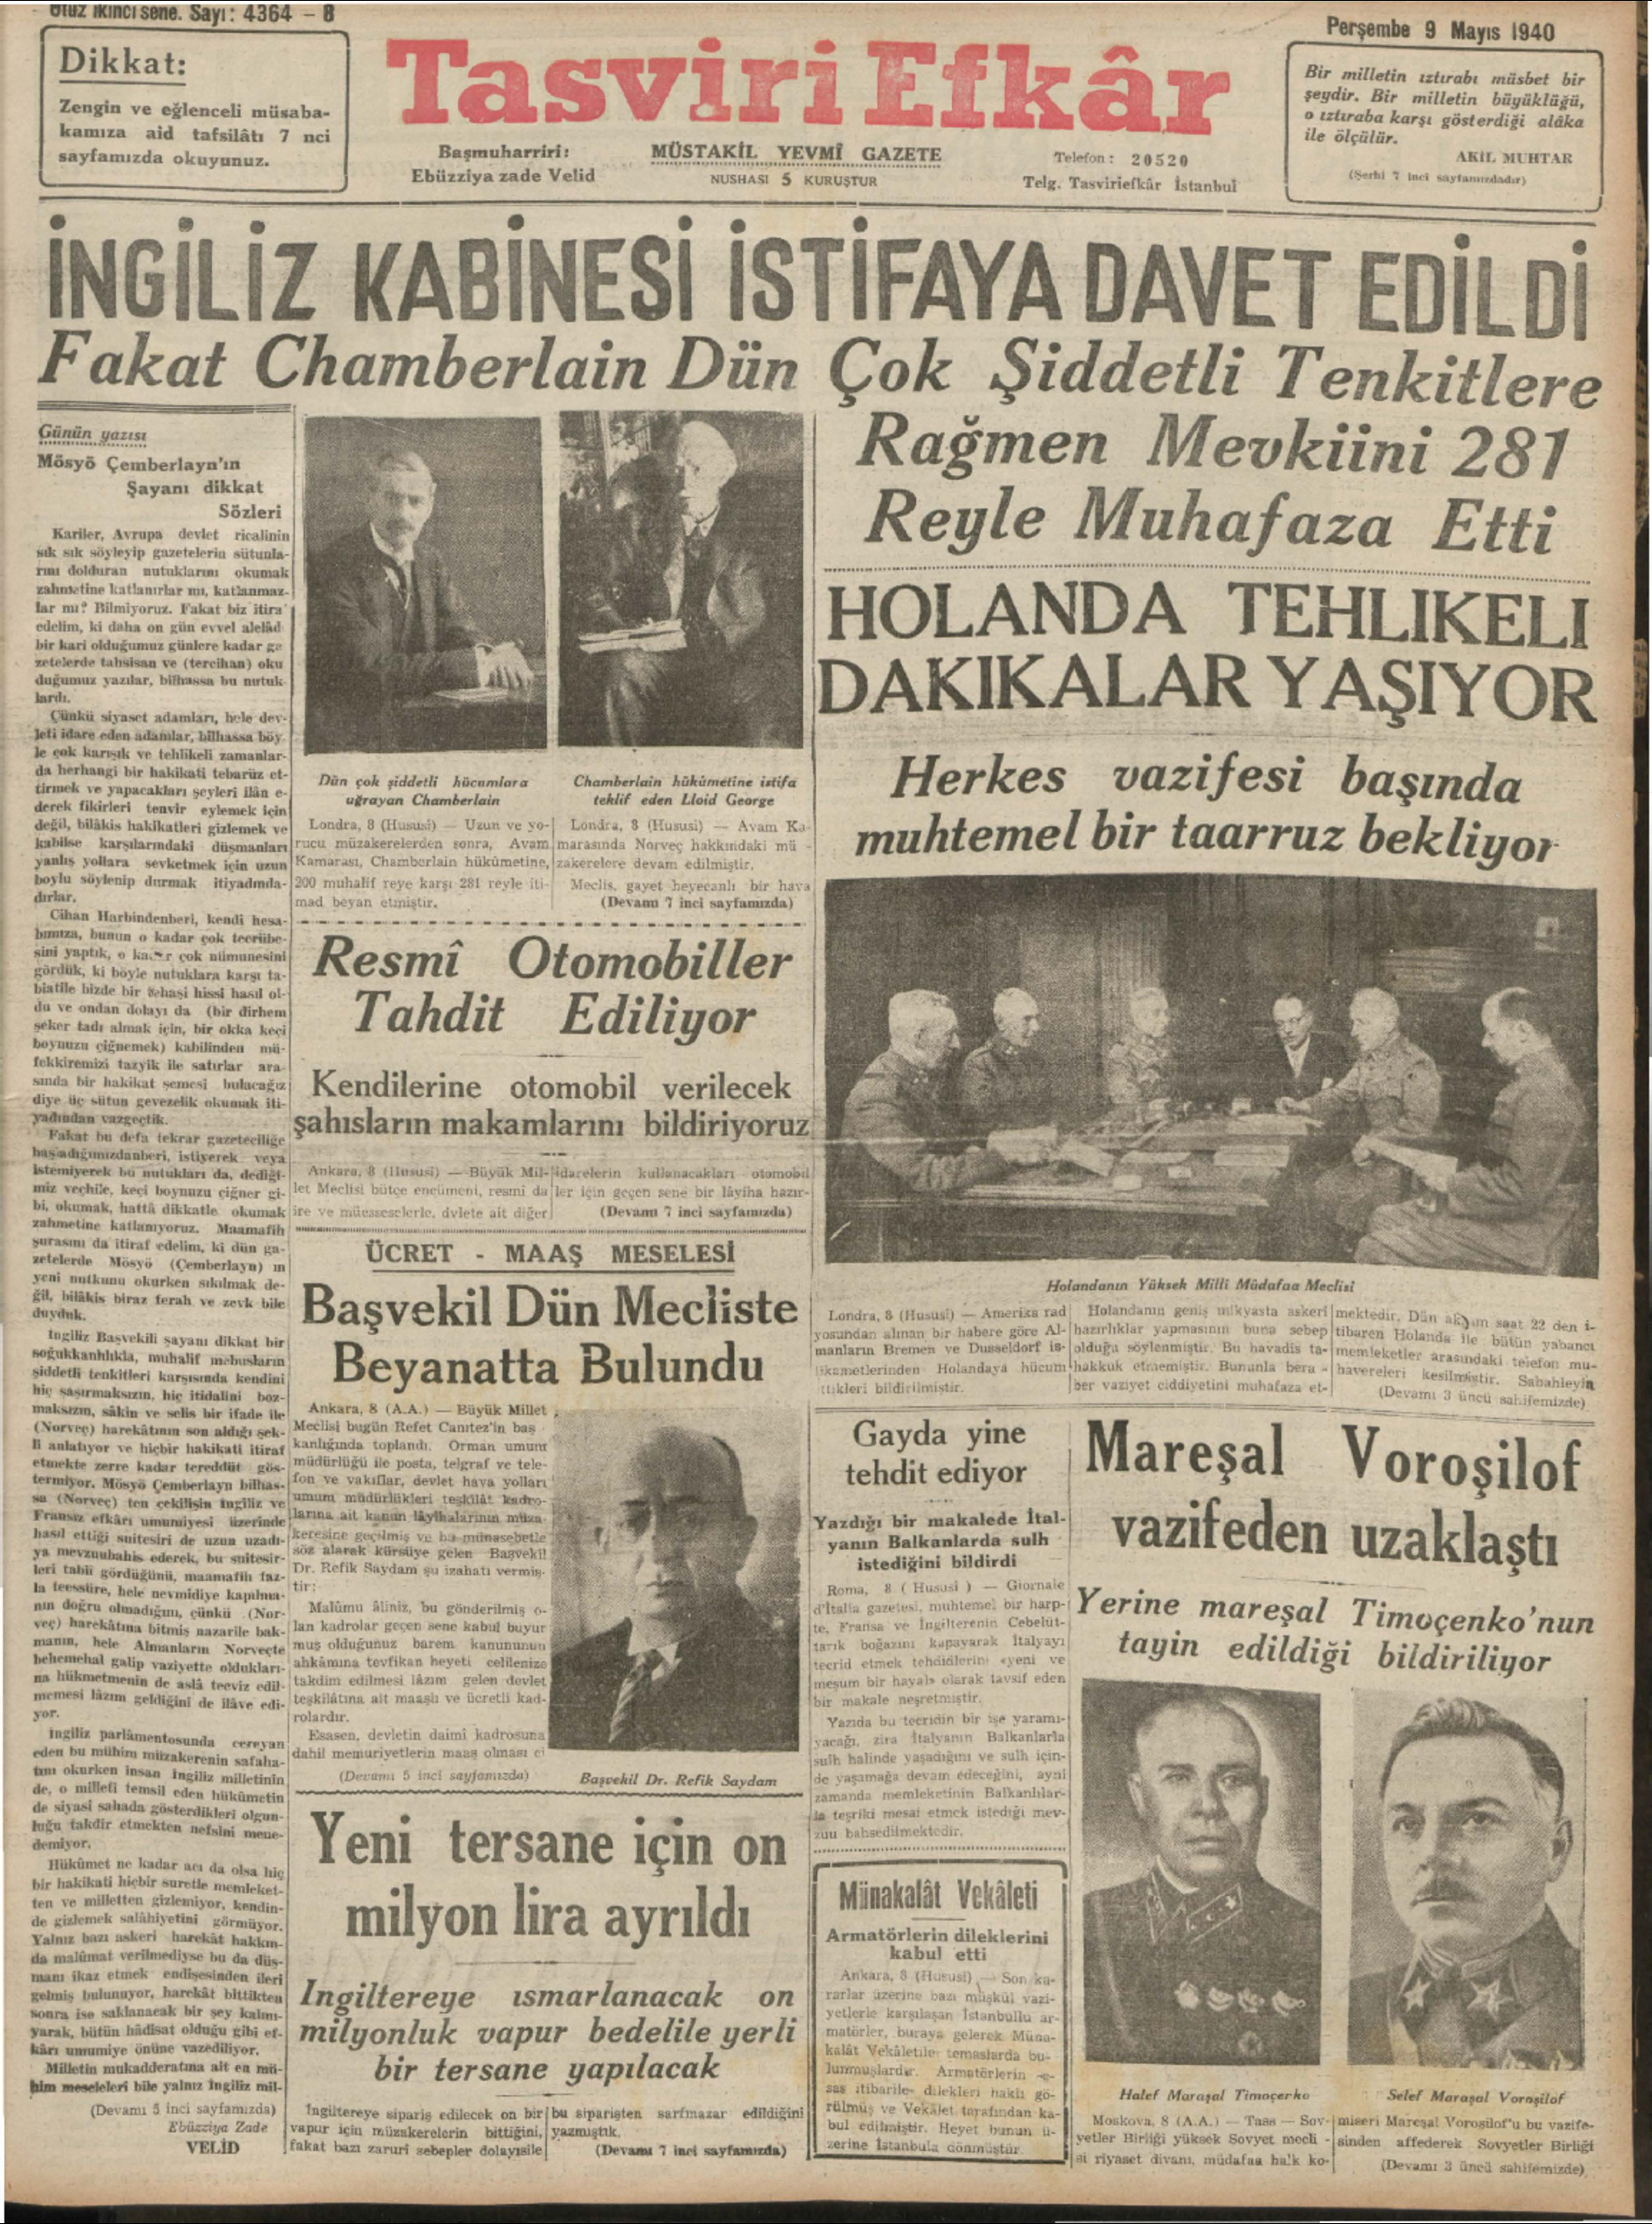 9 Mayıs 1940 Tarihli Tasviri Efkar Gazetesi Sayfa 1